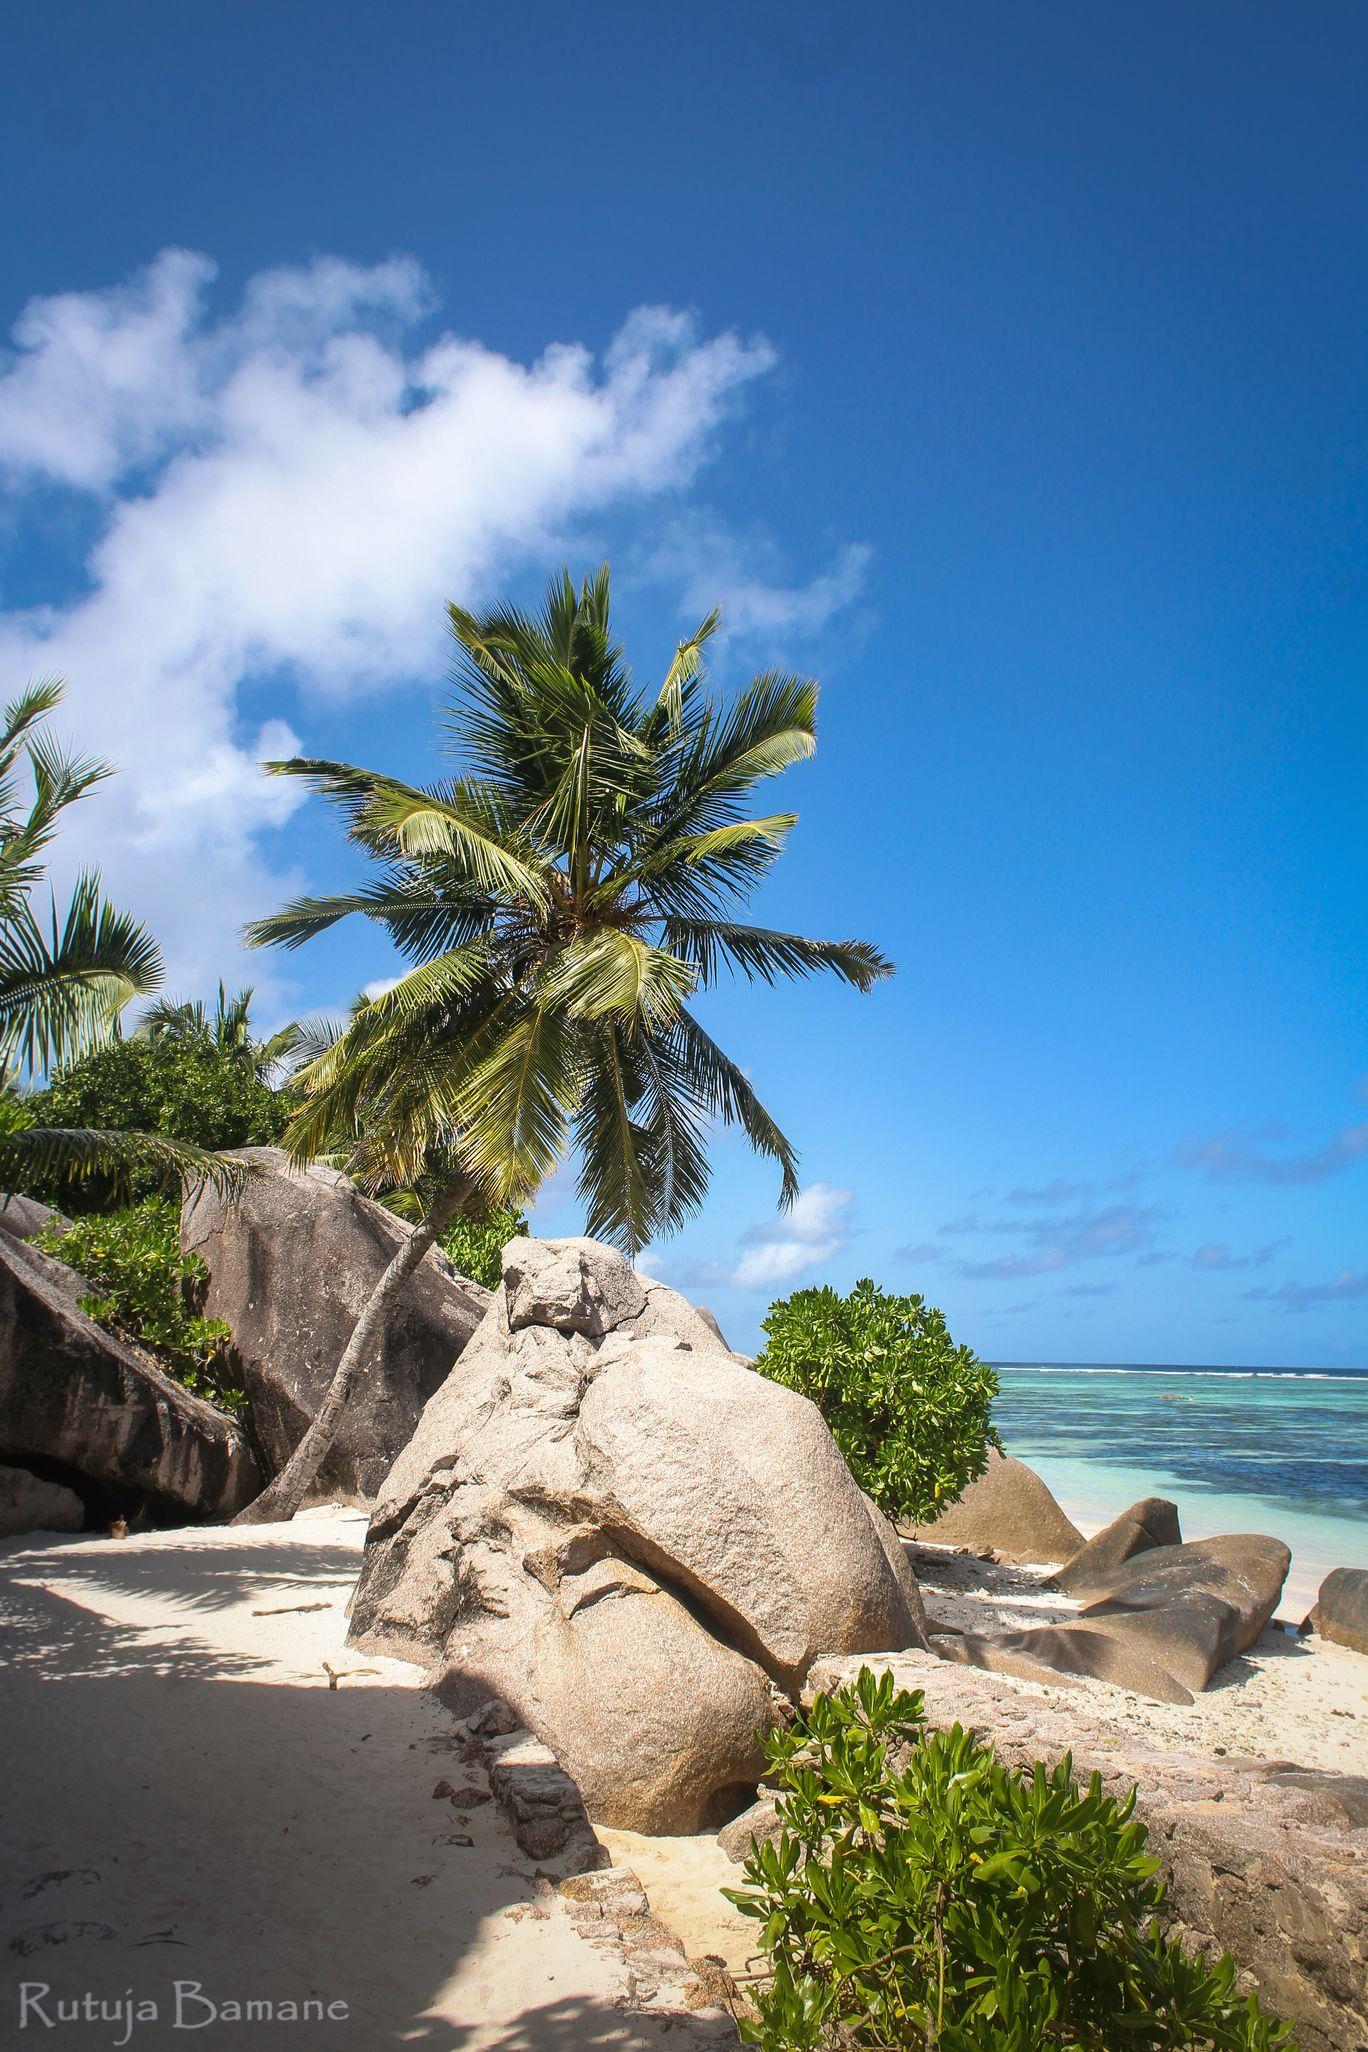 Photo of Seychelles By Rutuja Bamane